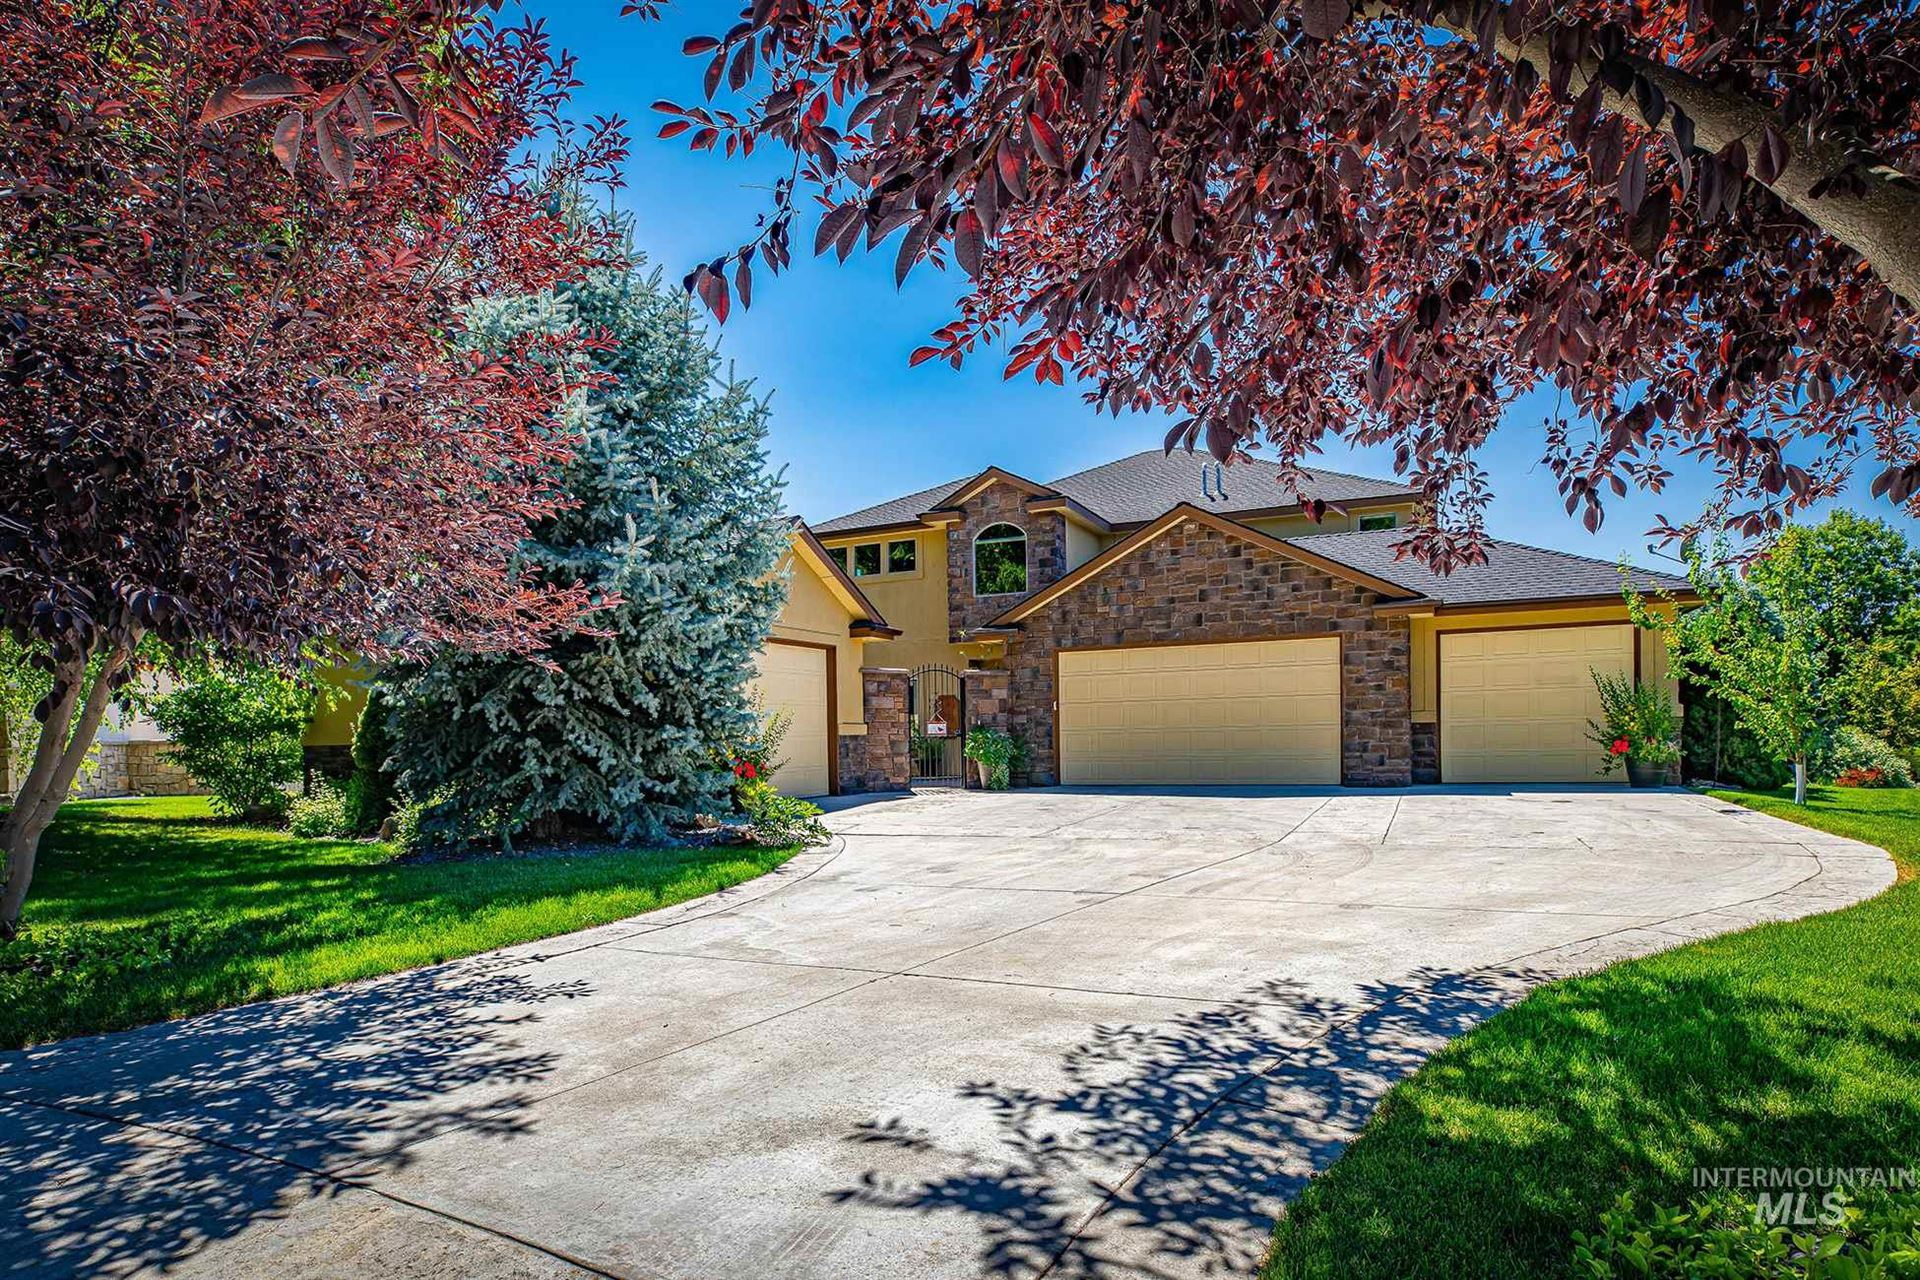 Photo of 1398 W Overlake, Eagle, ID 83616 (MLS # 98776491)